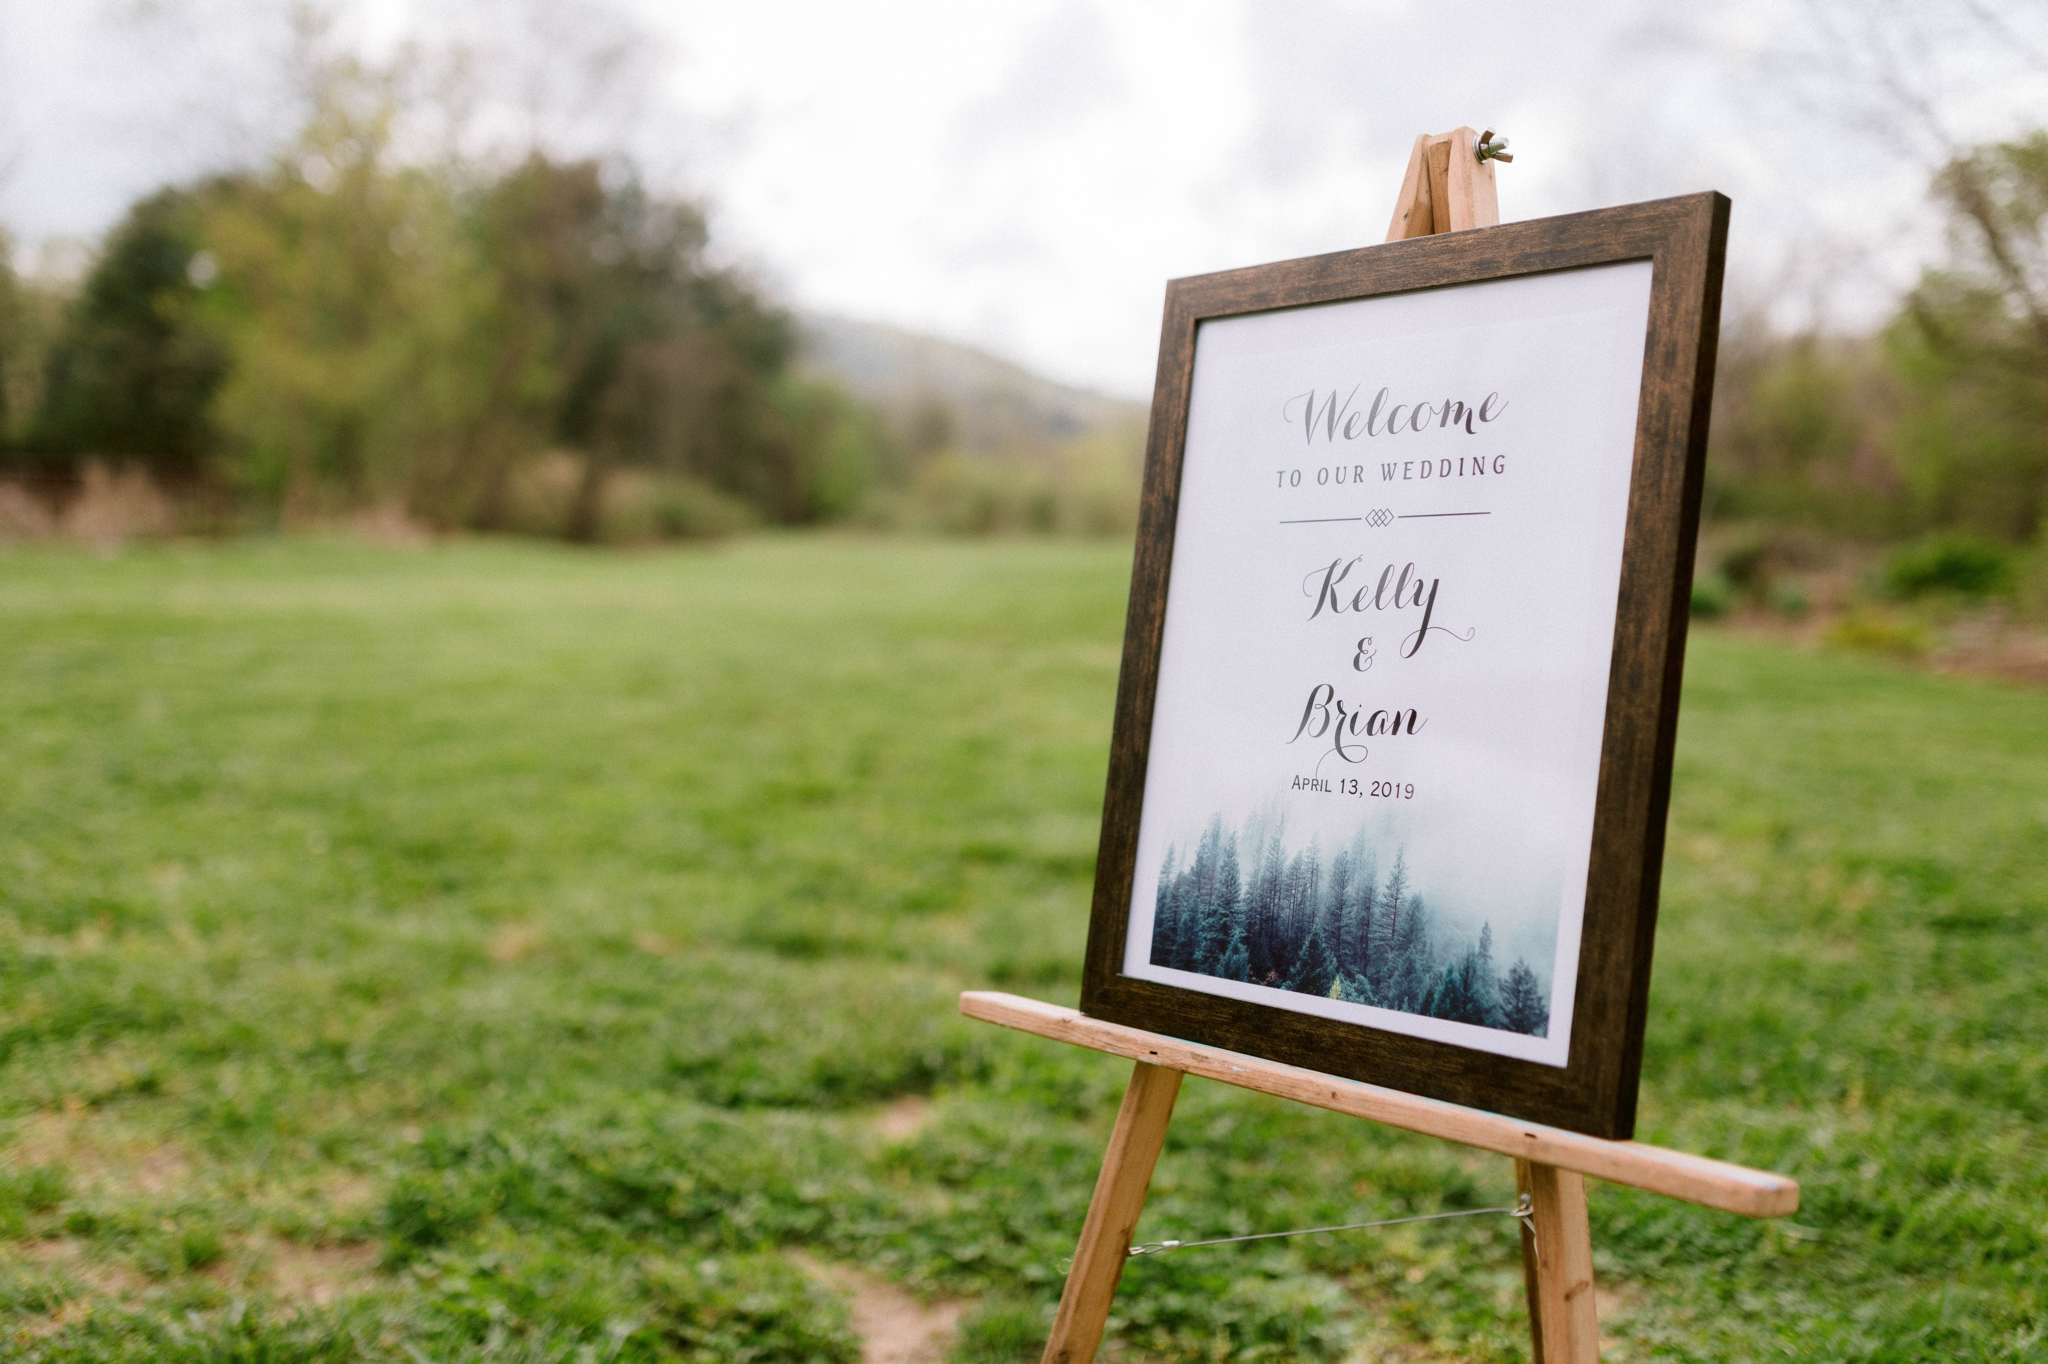 welcome sign for a wedding - Honolulu Oahu Hawaii Wedding Photographer